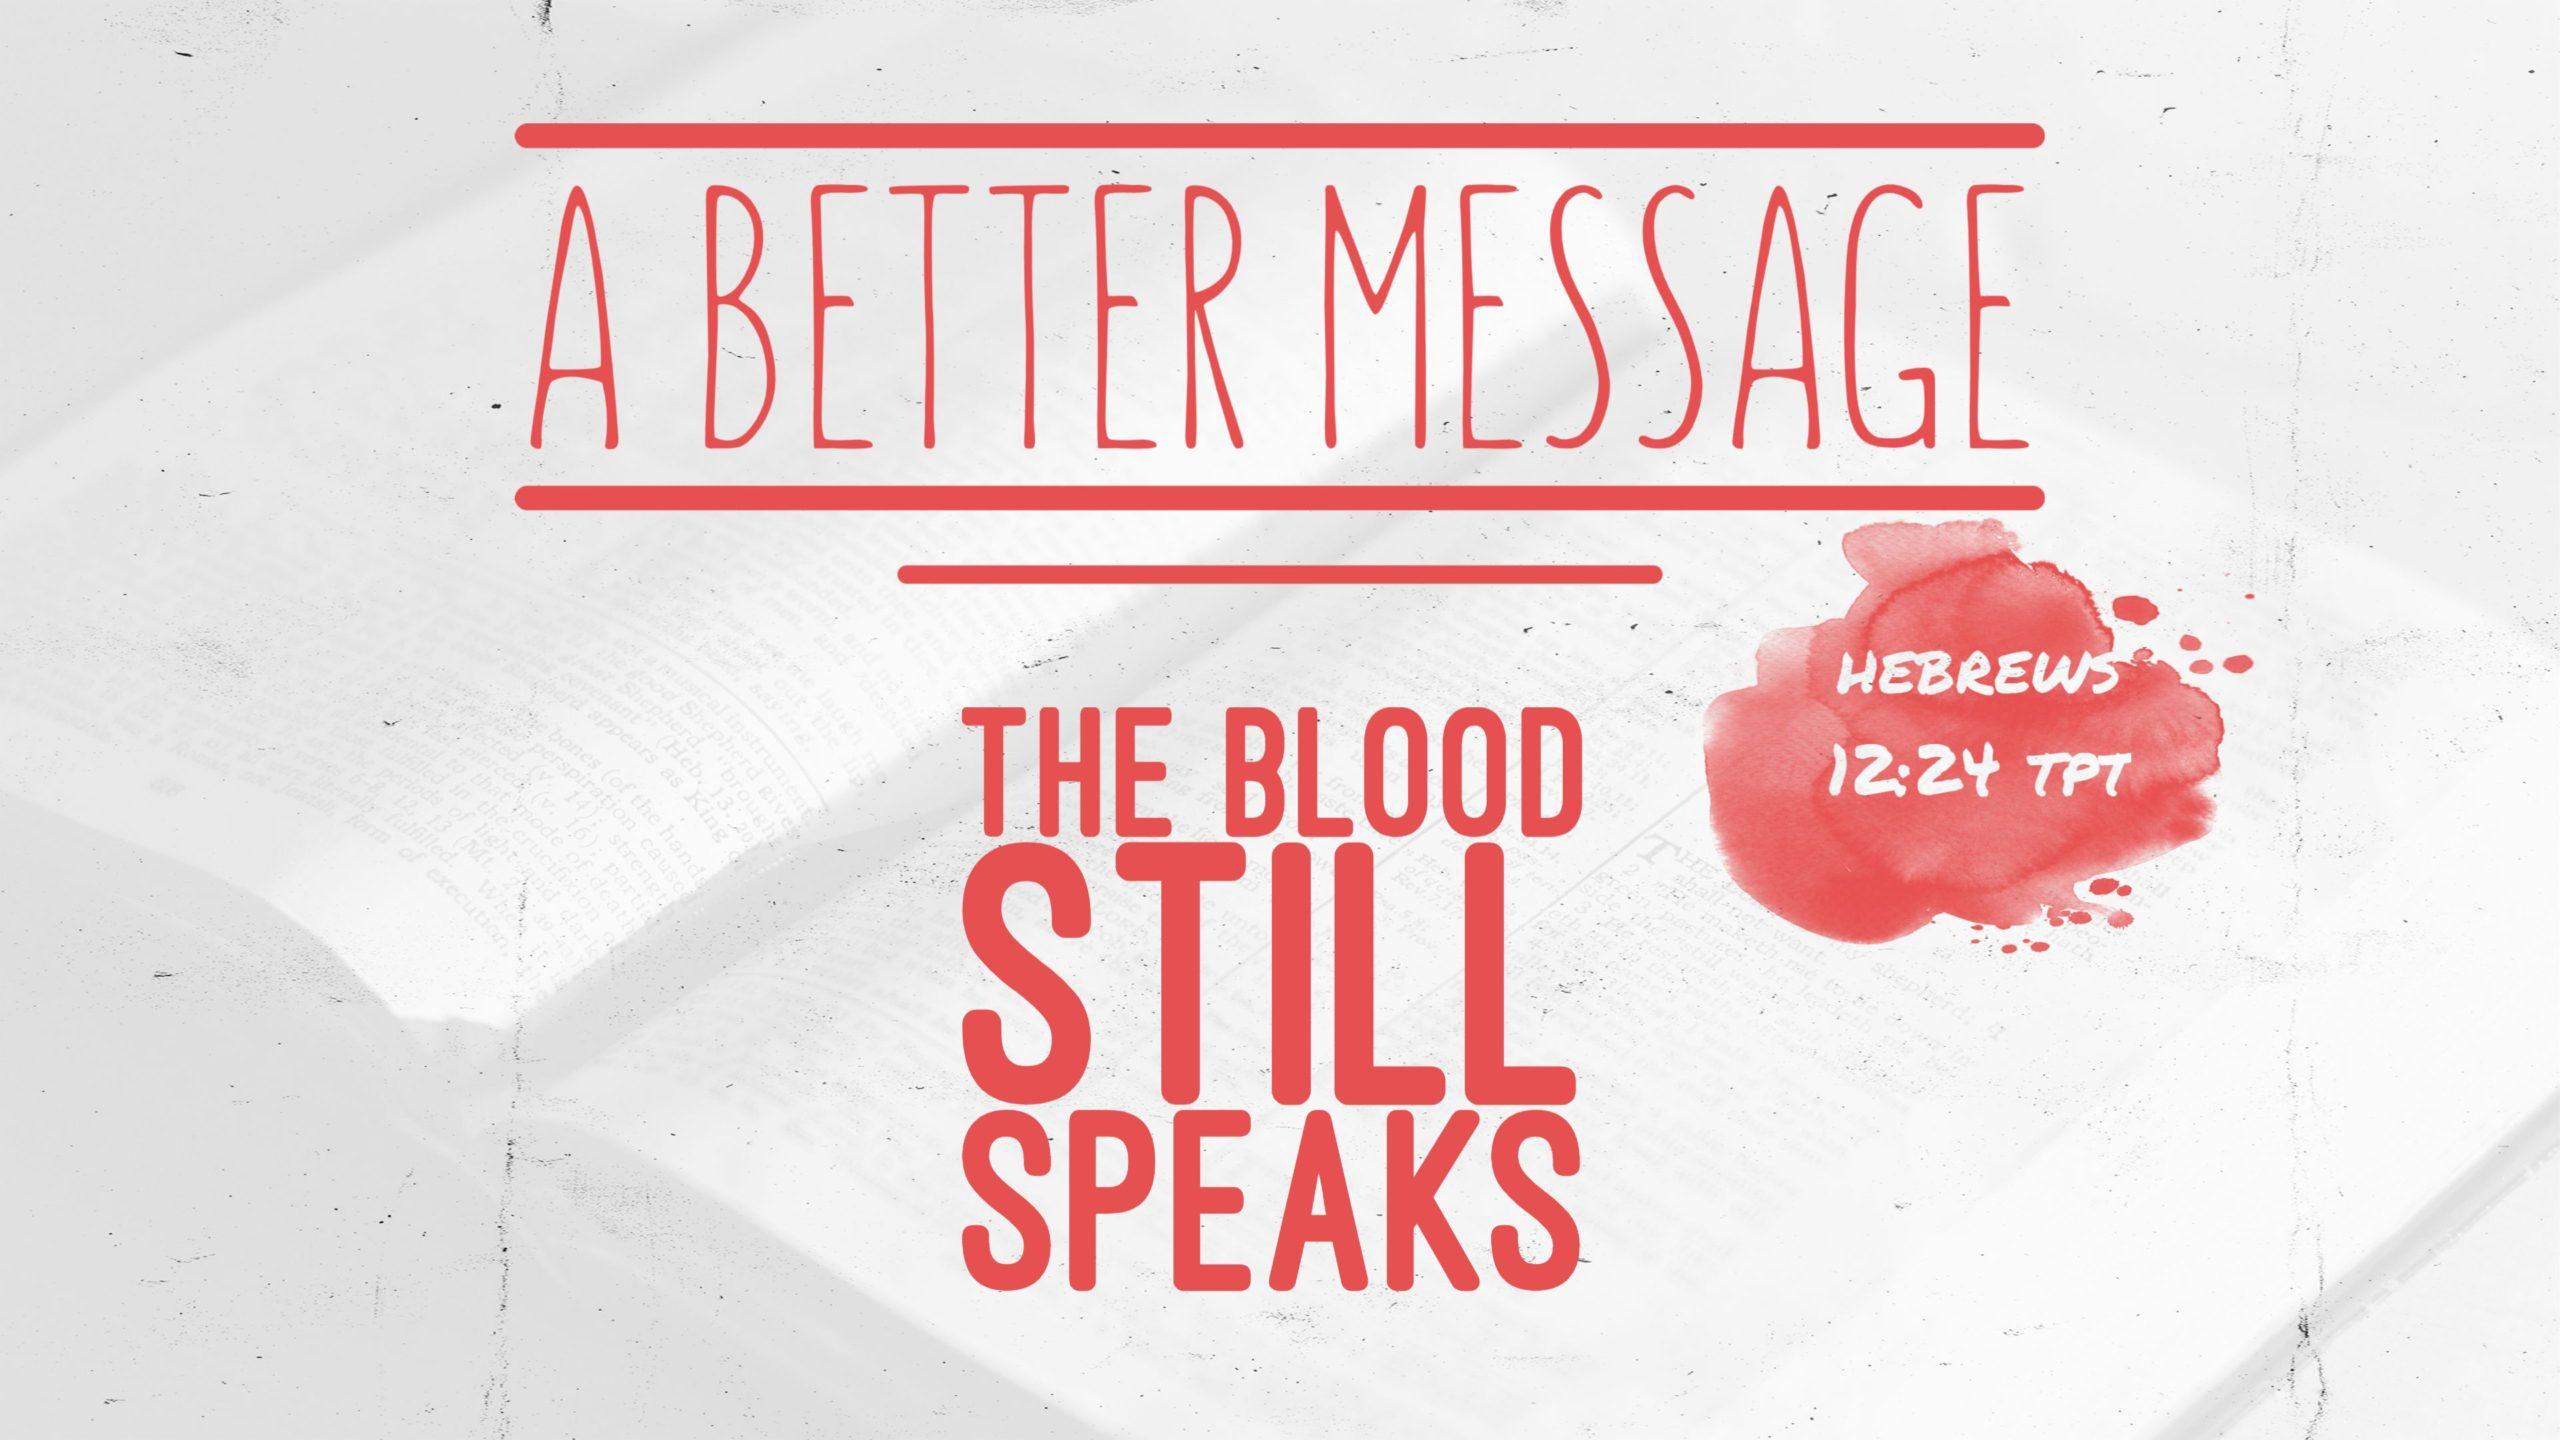 Aug 23: A Better Message: The Blood Still Speaks, Pt. 2